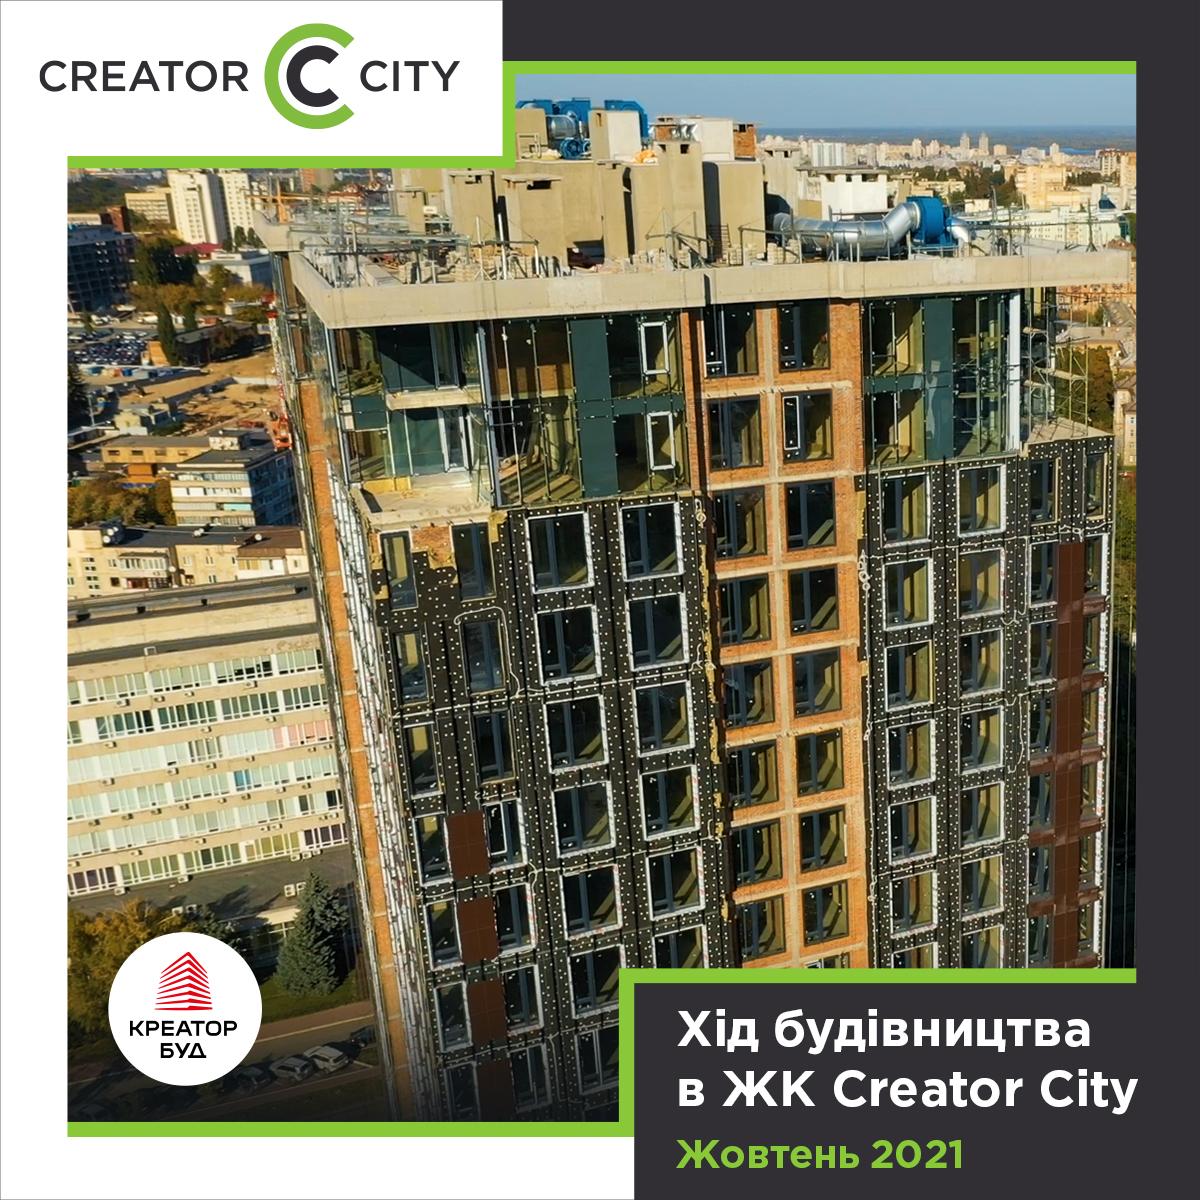 1200-1200_creator_city.jpg